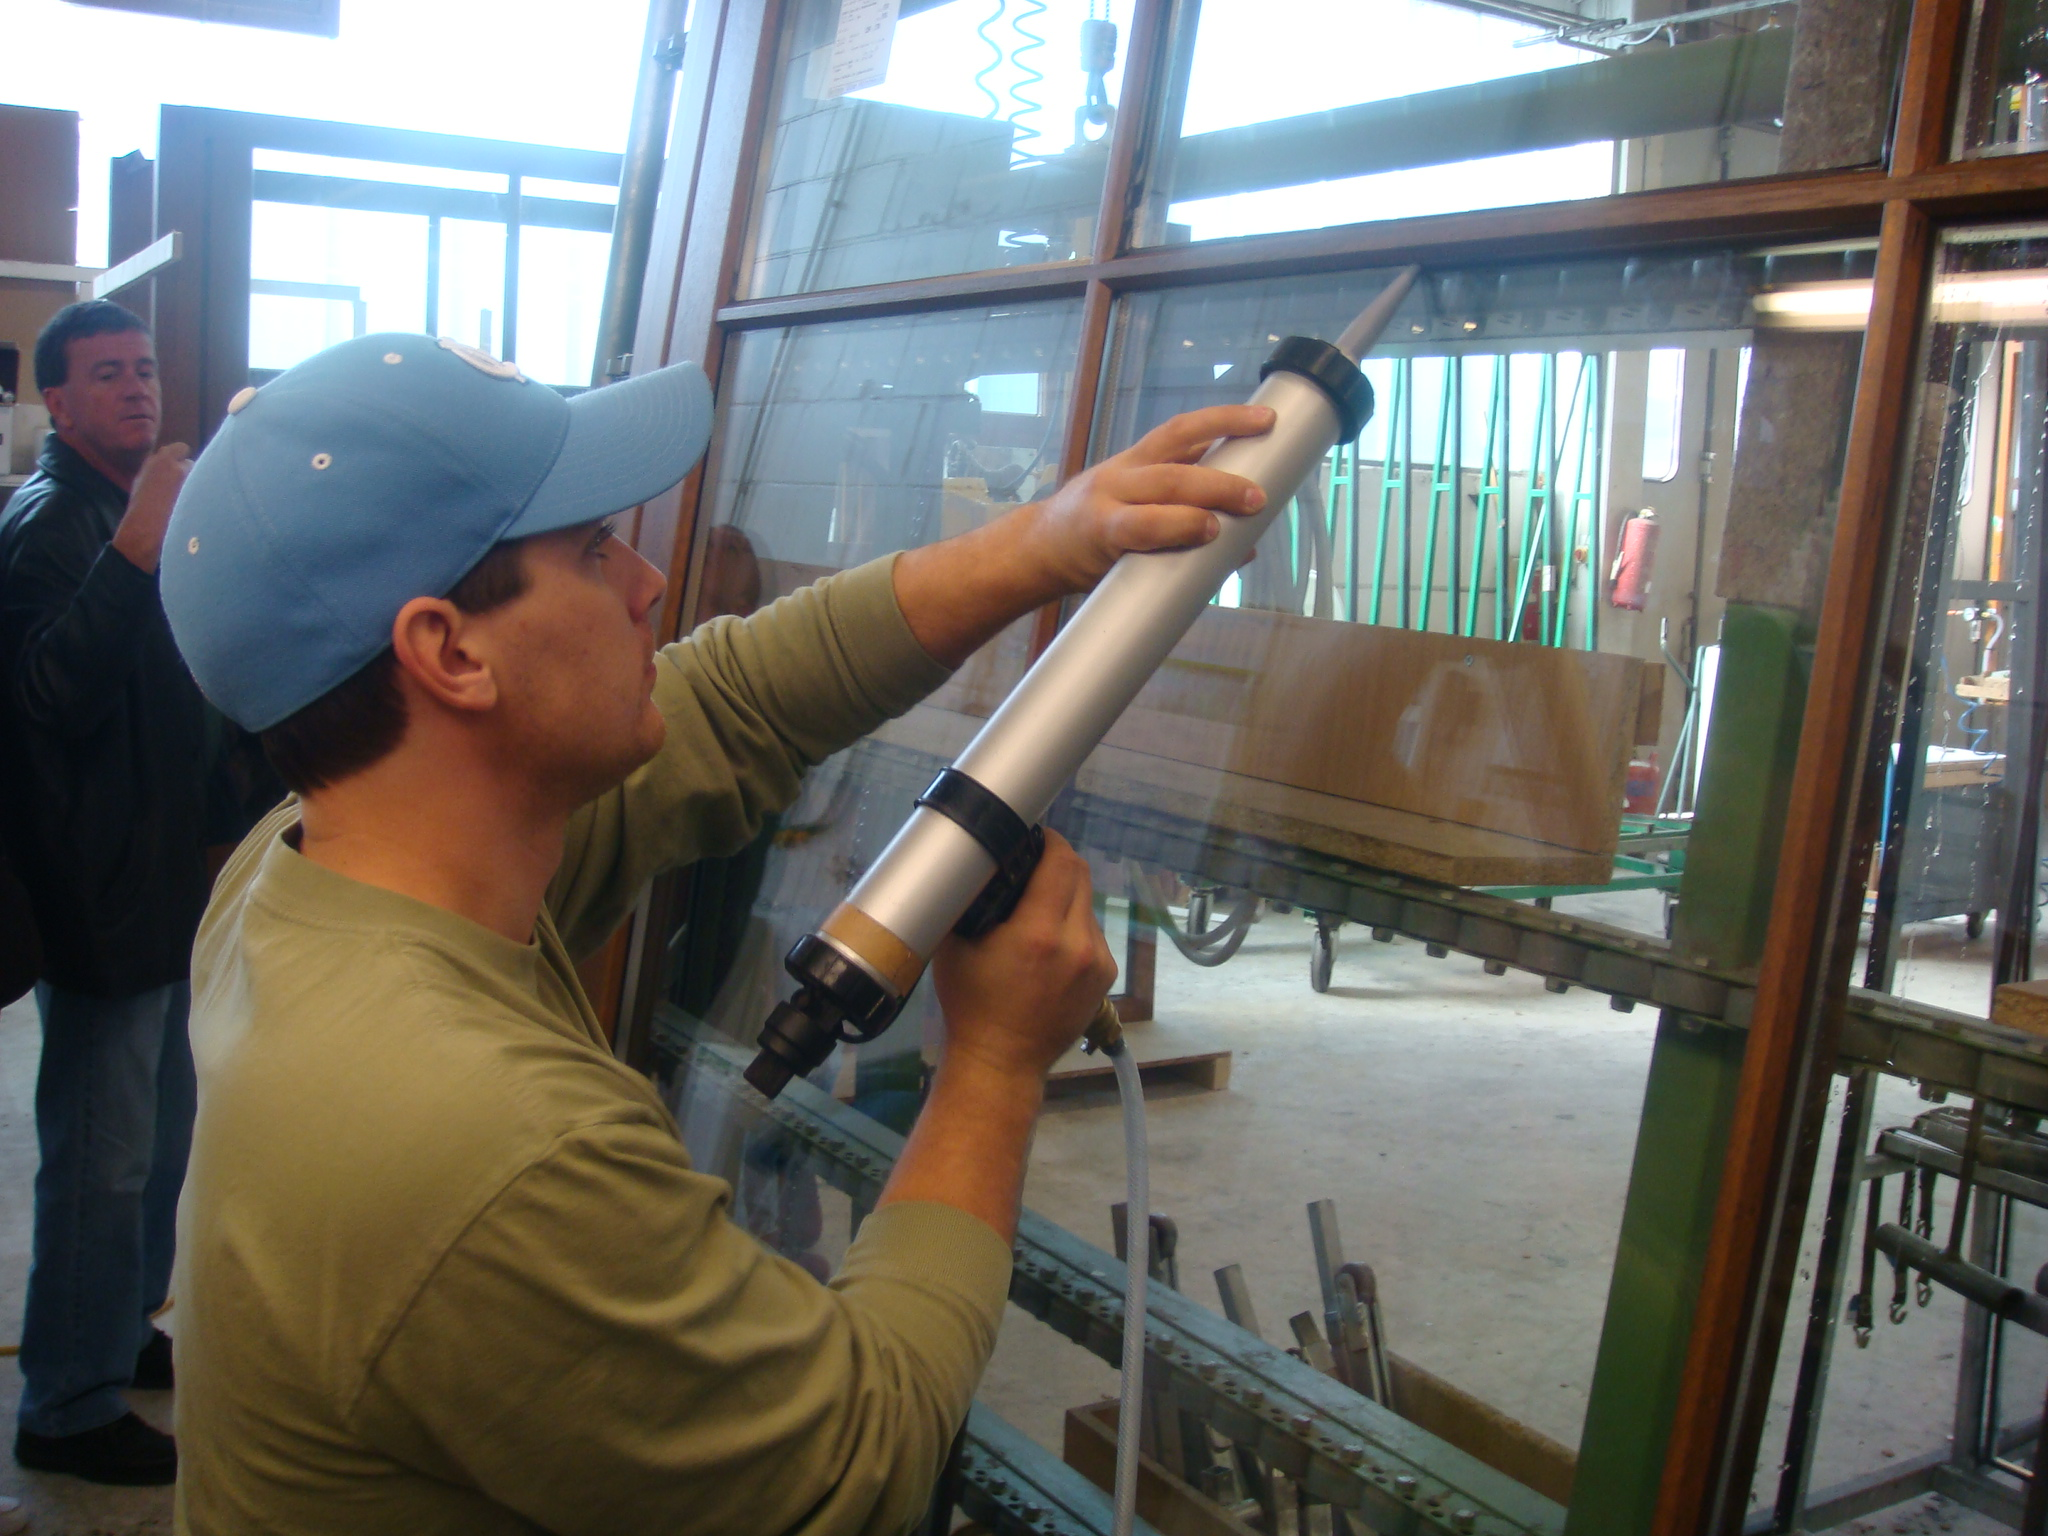 Professional Training for Glazing Hurricane Windows